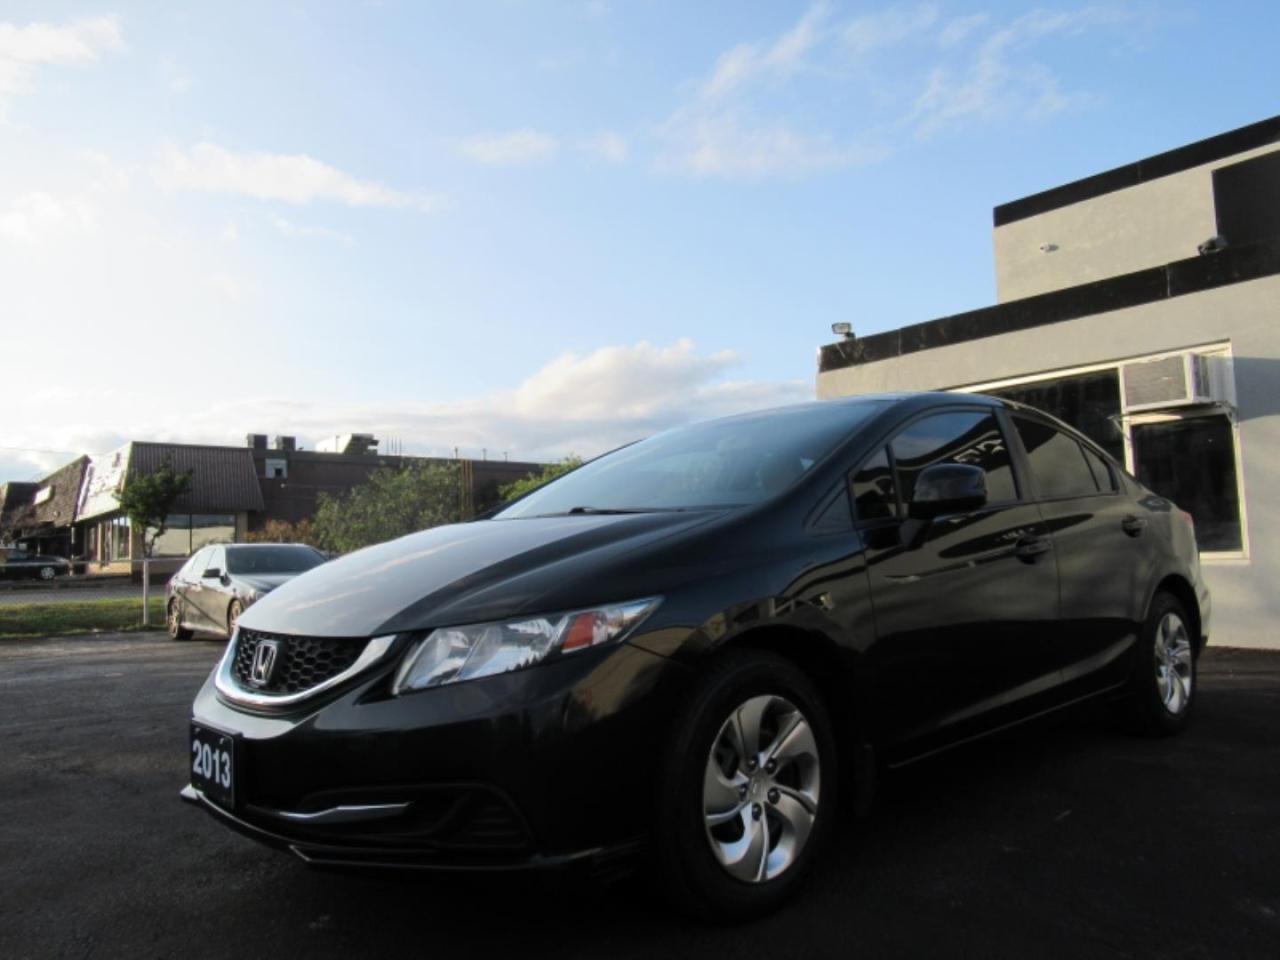 2013 Honda Civic 4dr Auto LX (SOLD)